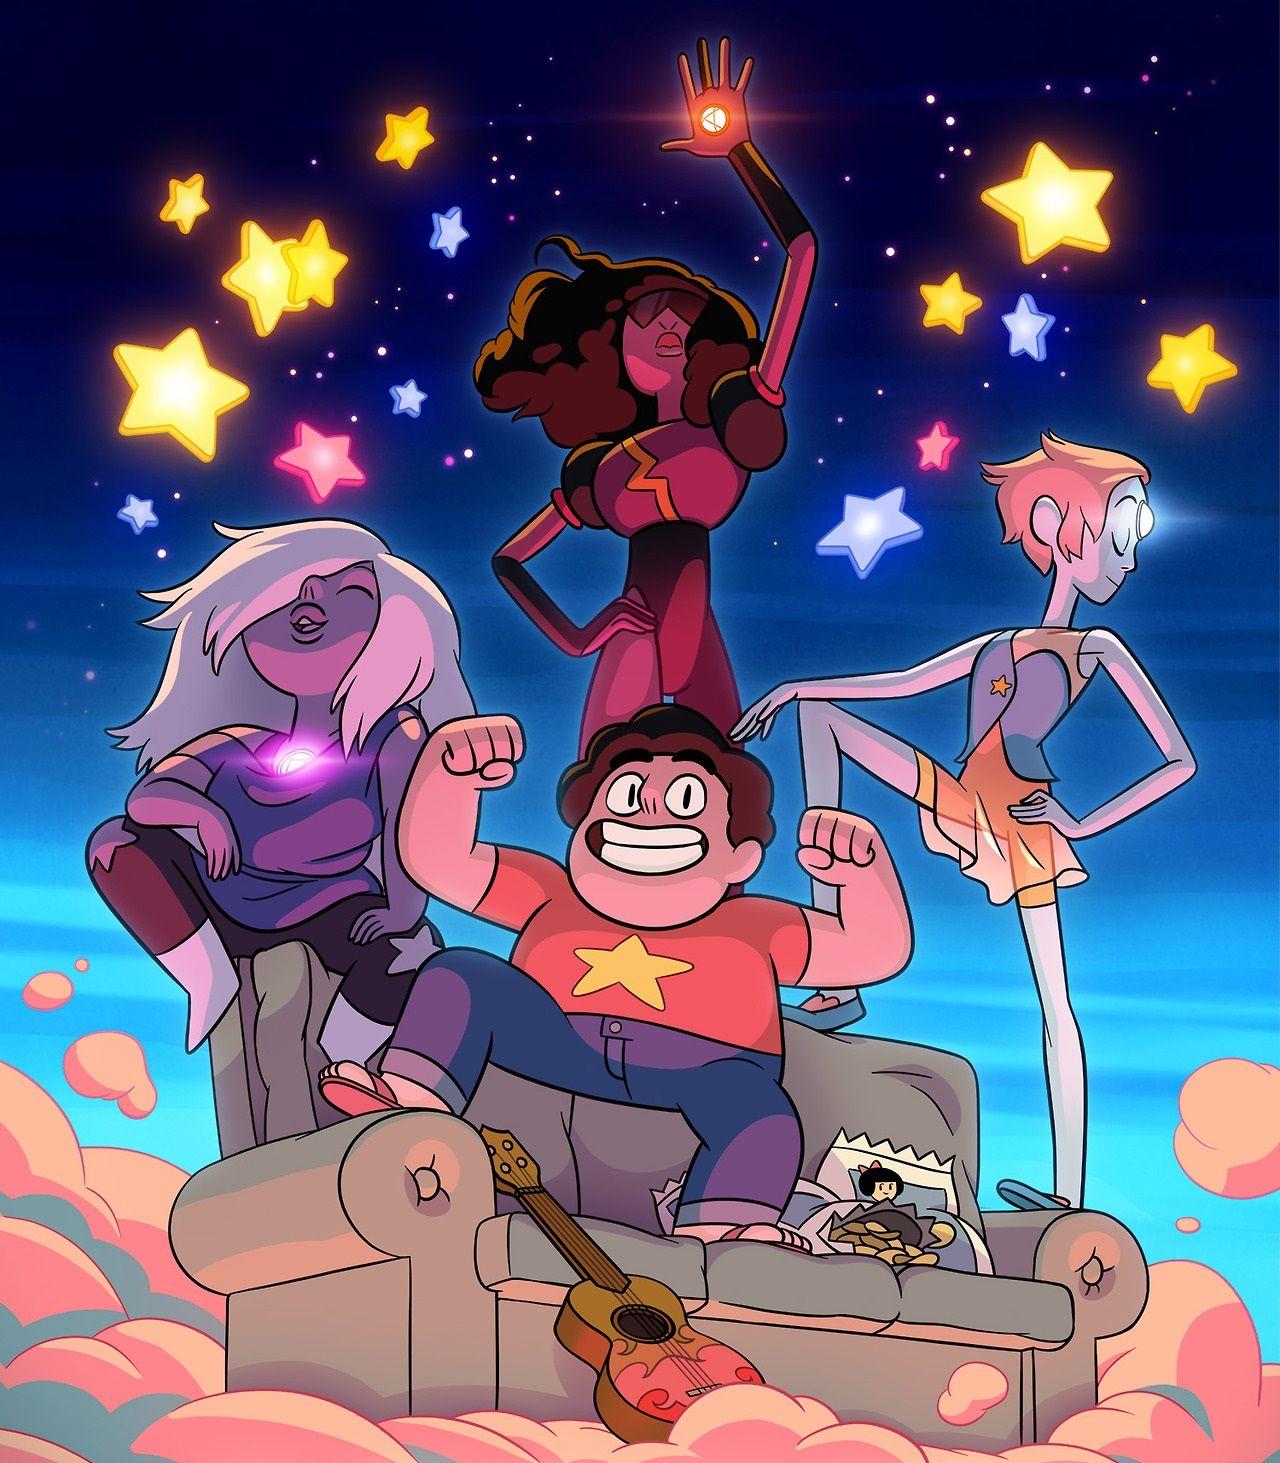 Pin by ︎☹︎ Miggy ☹︎ ︎ on Steven universe Steven universe